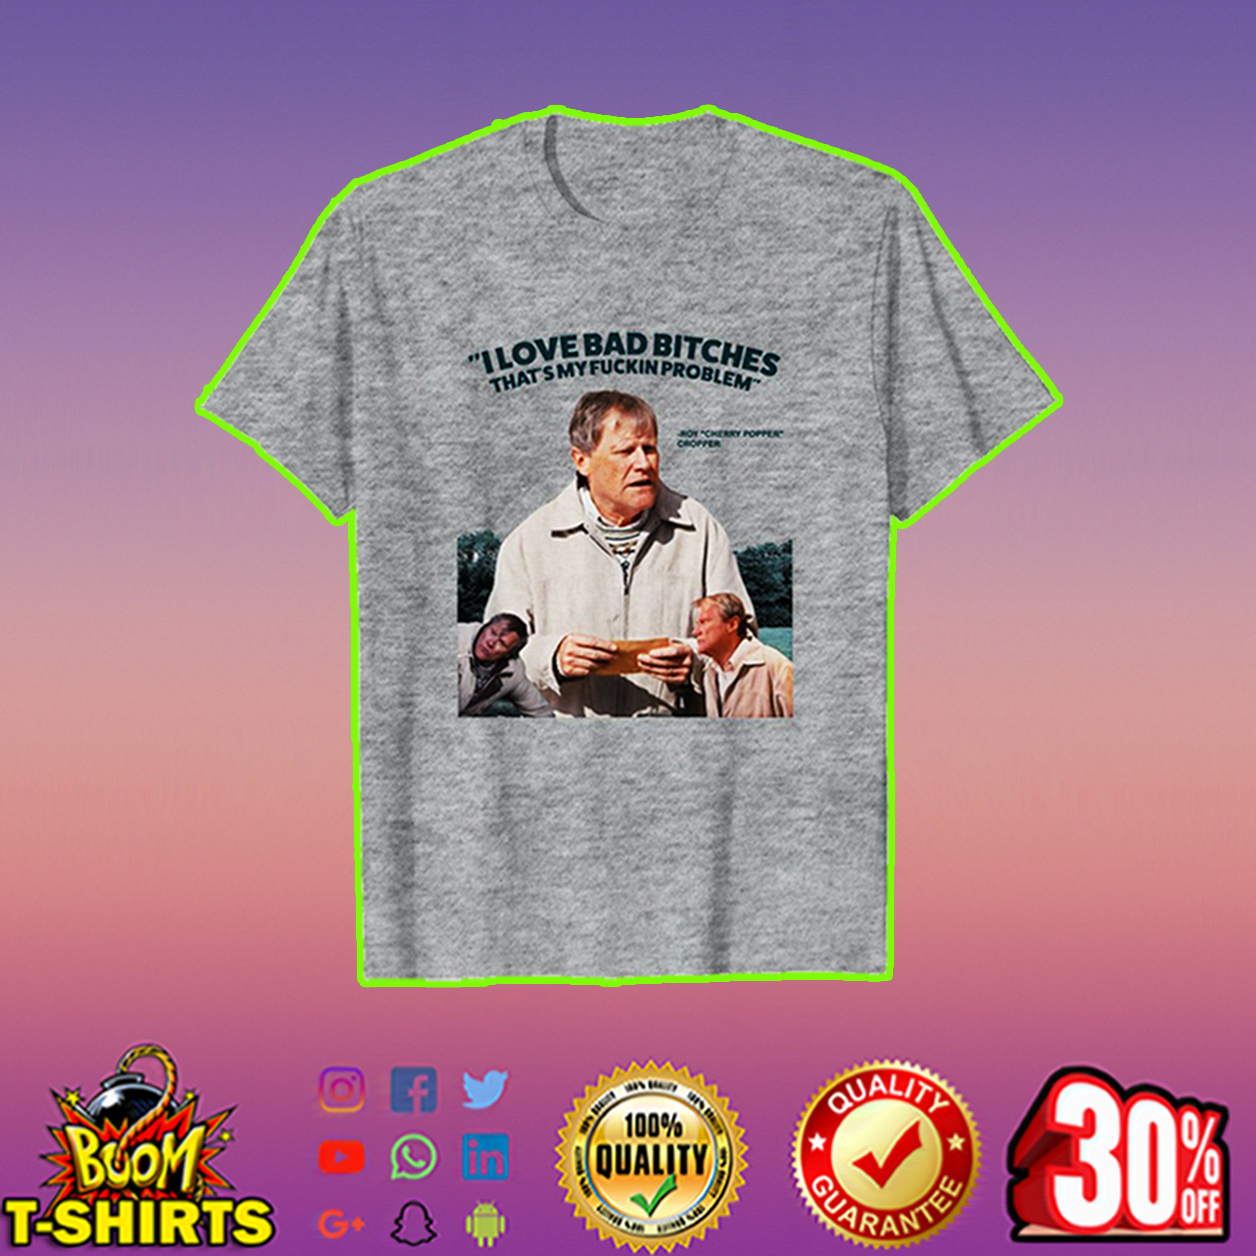 Roy Cropper I love bad bitches that's my fuckin problem shirt